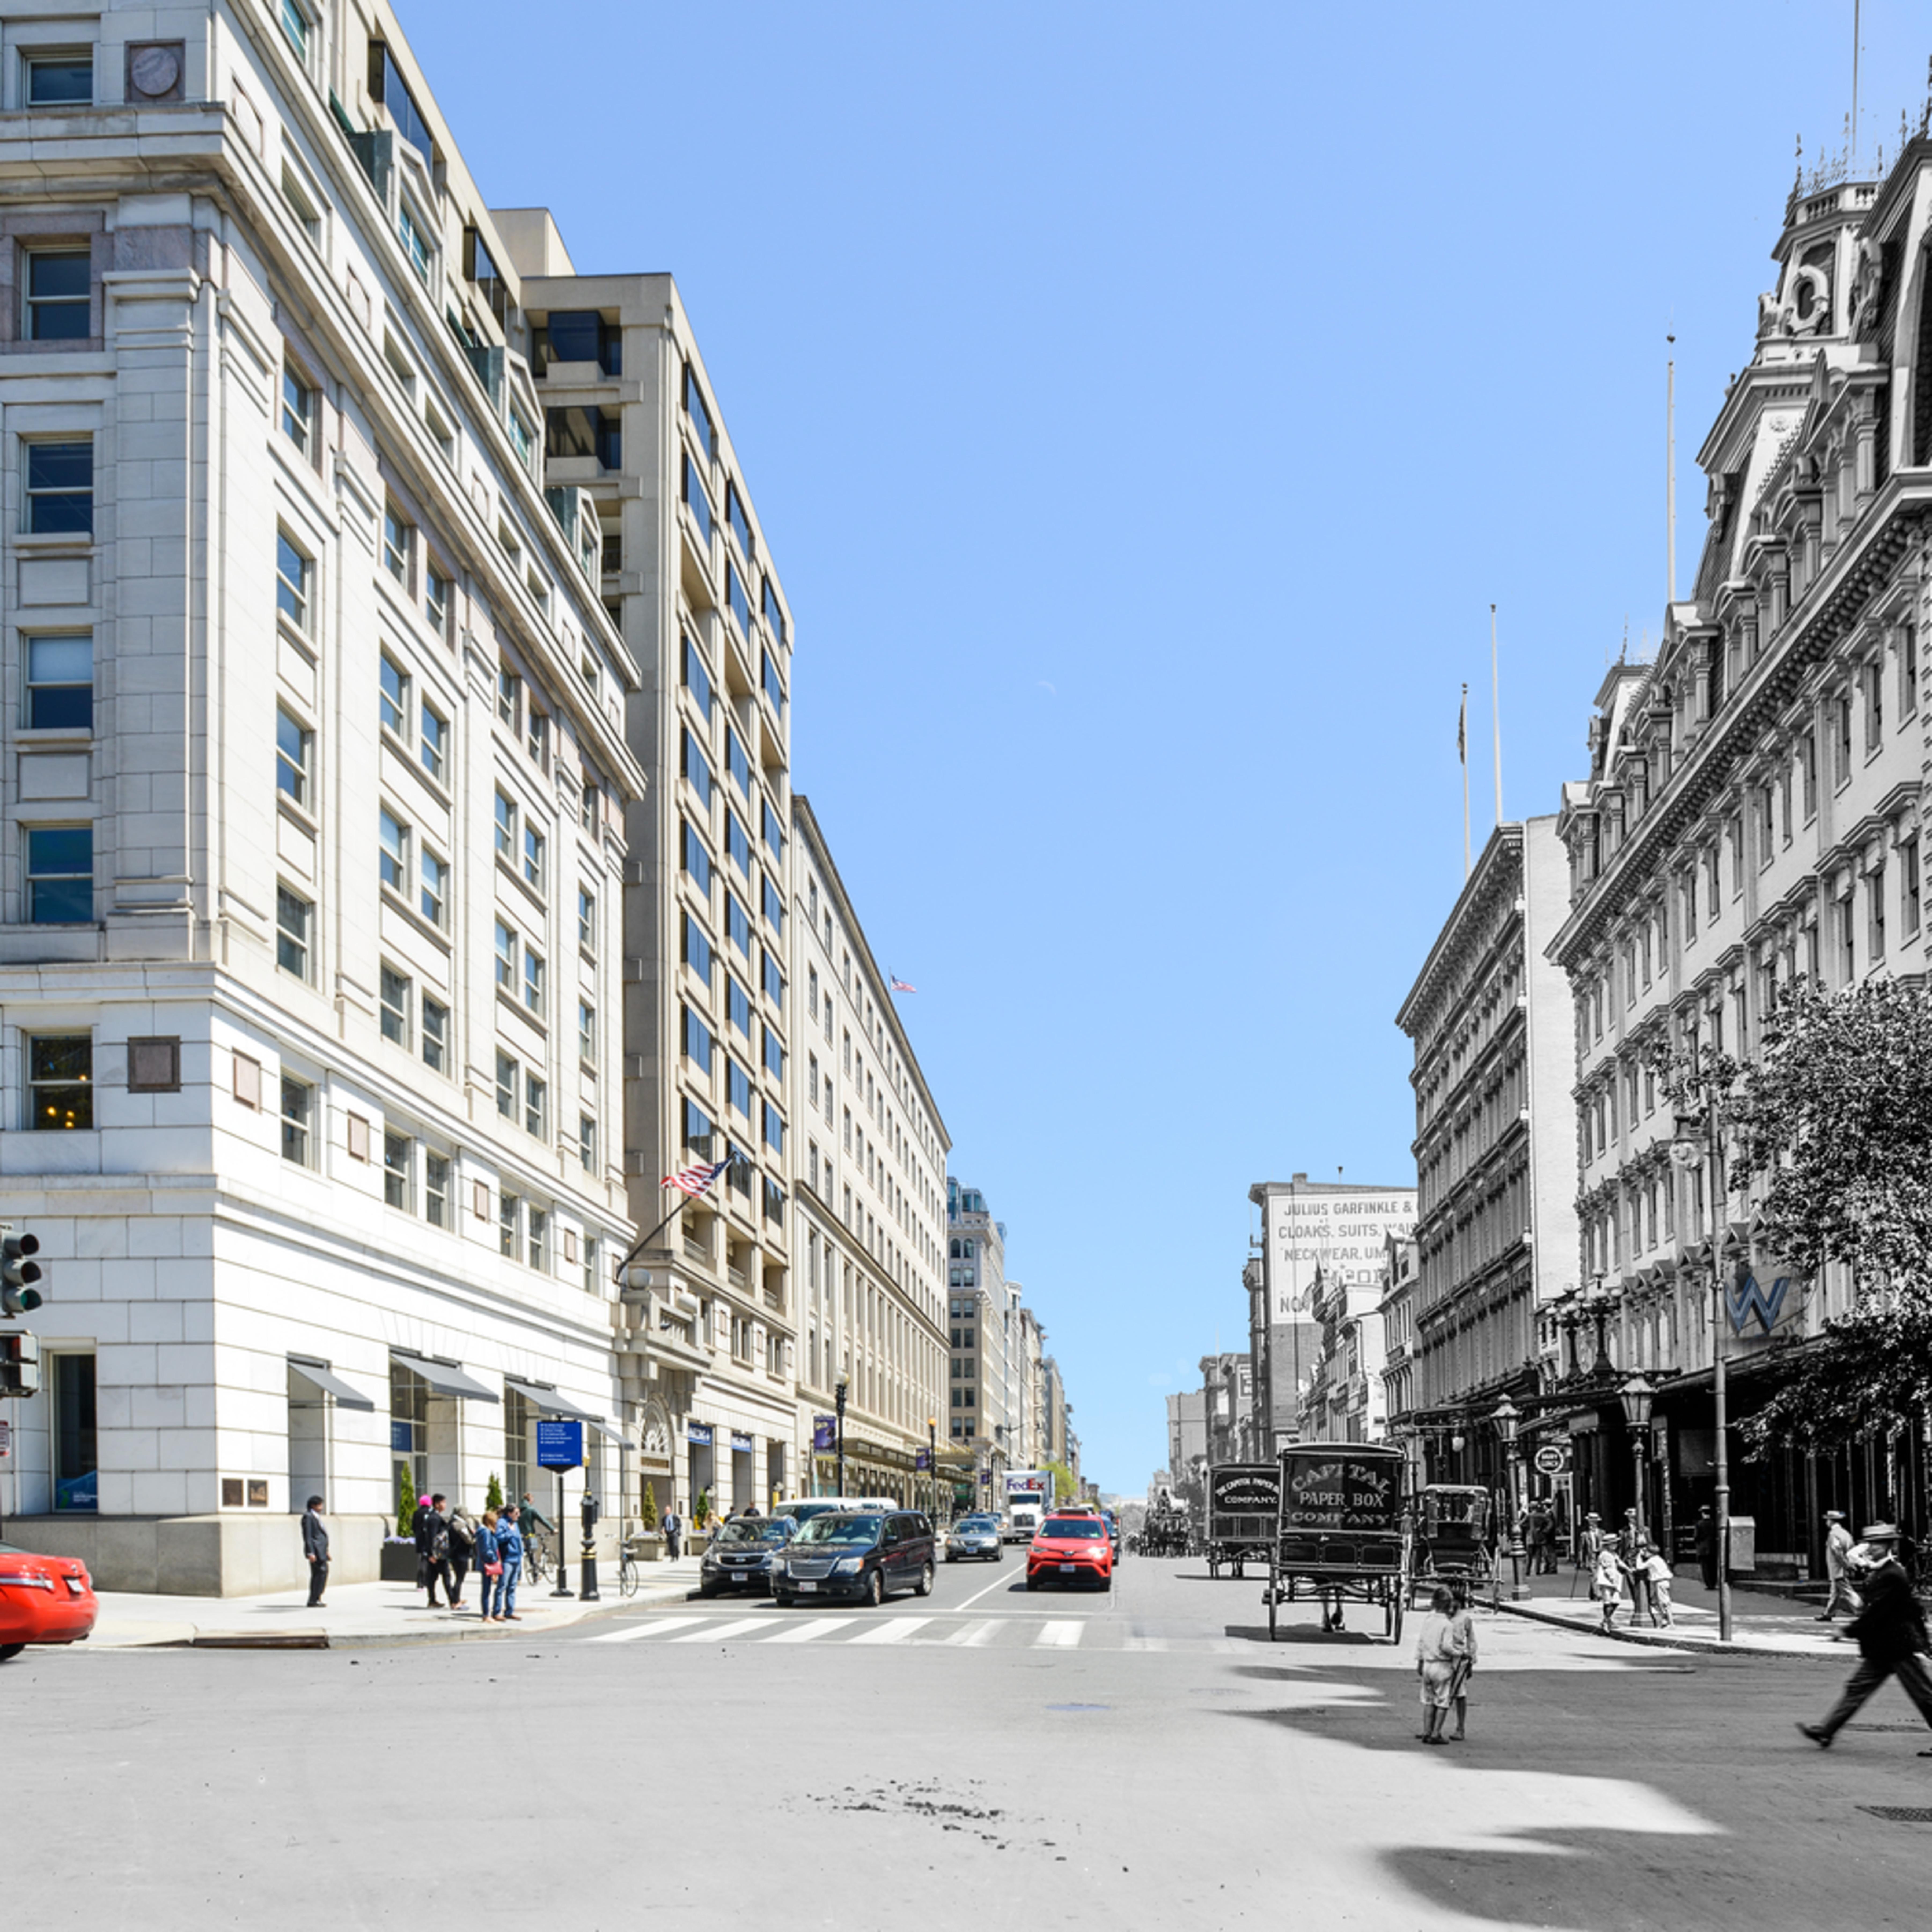 Dsc 1030 f street from dept. of the treasury washington d.c. iawbex